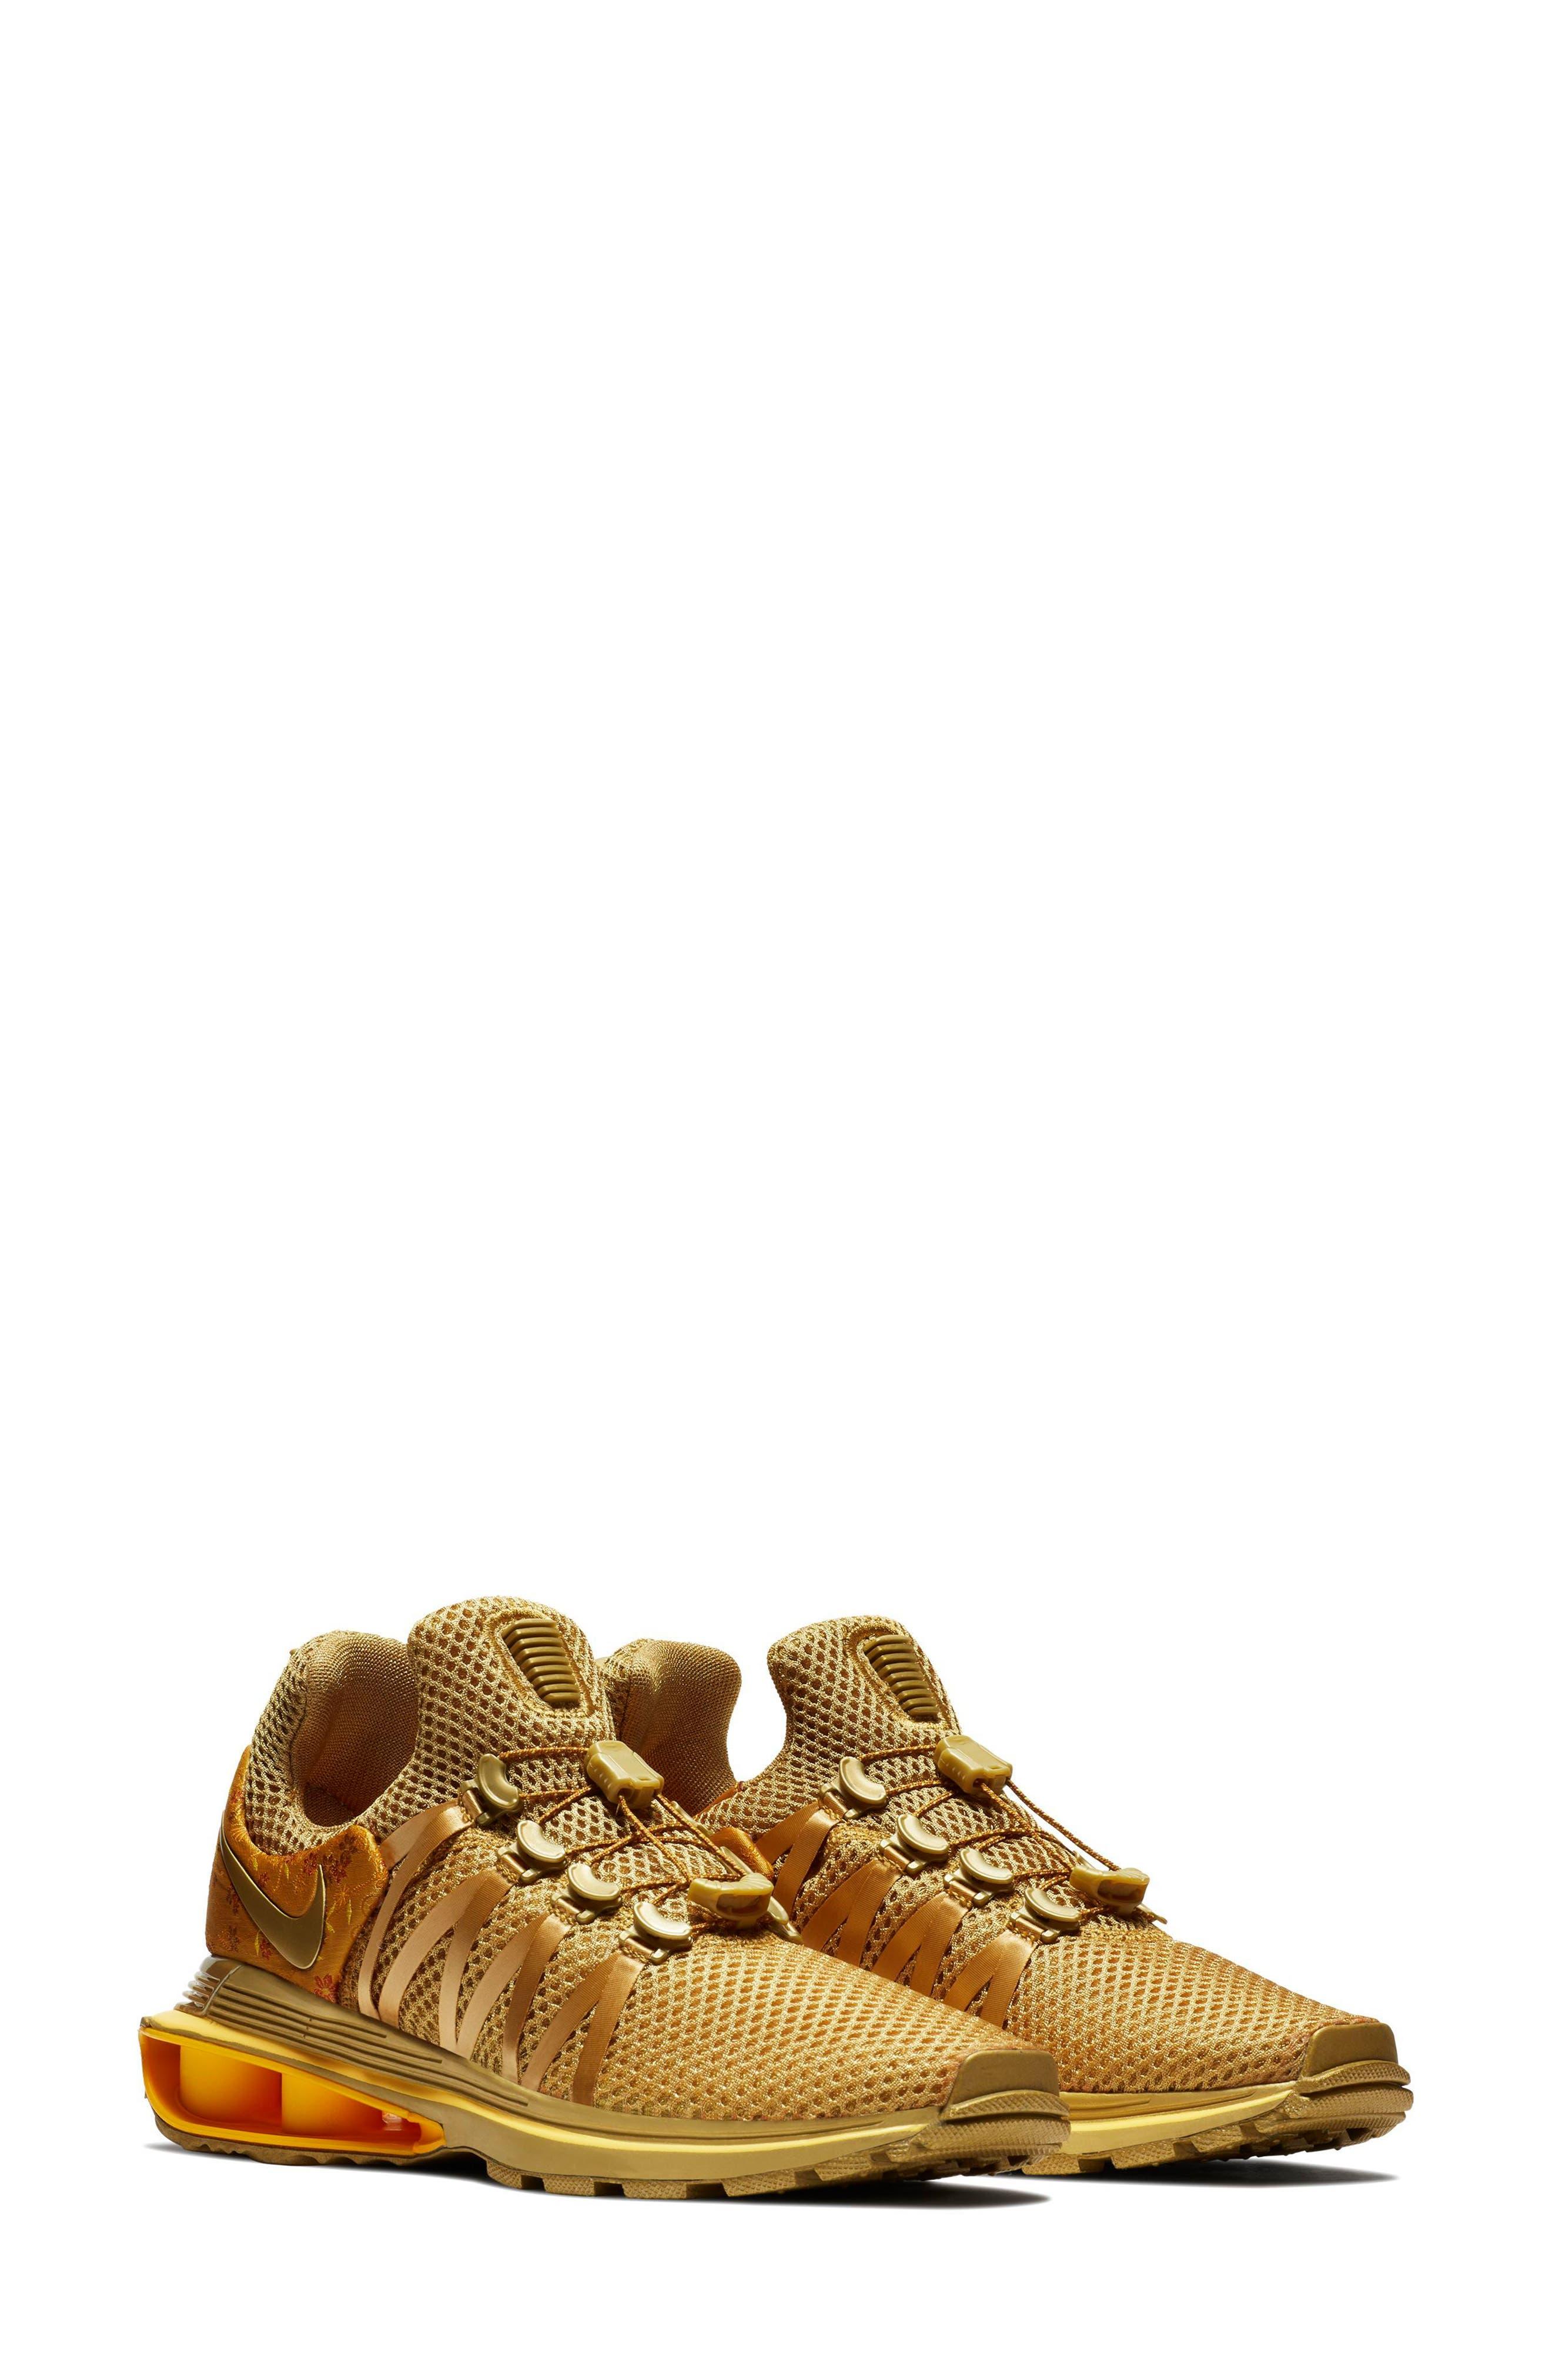 Shox Gravity Sneaker,                             Main thumbnail 1, color,                             Metallic Gold/ Metallic Gold